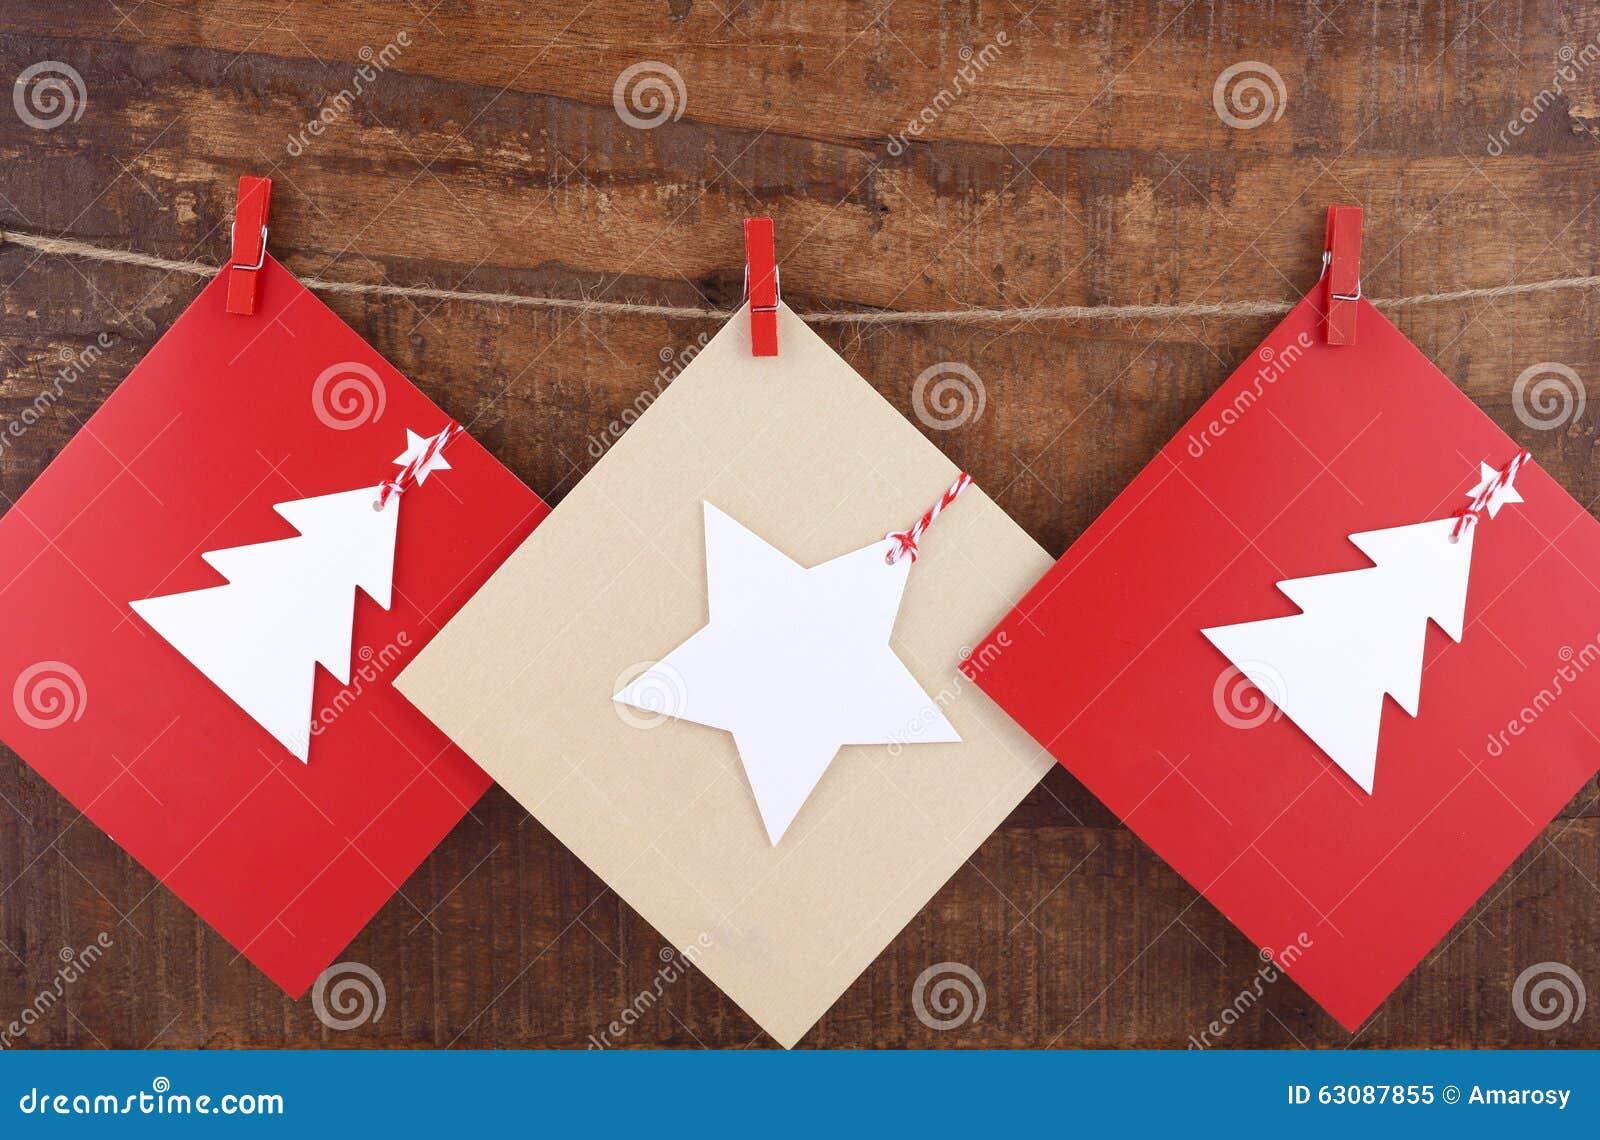 Handmade christmas greeting card stock image image of celebration handmade christmas greeting card m4hsunfo